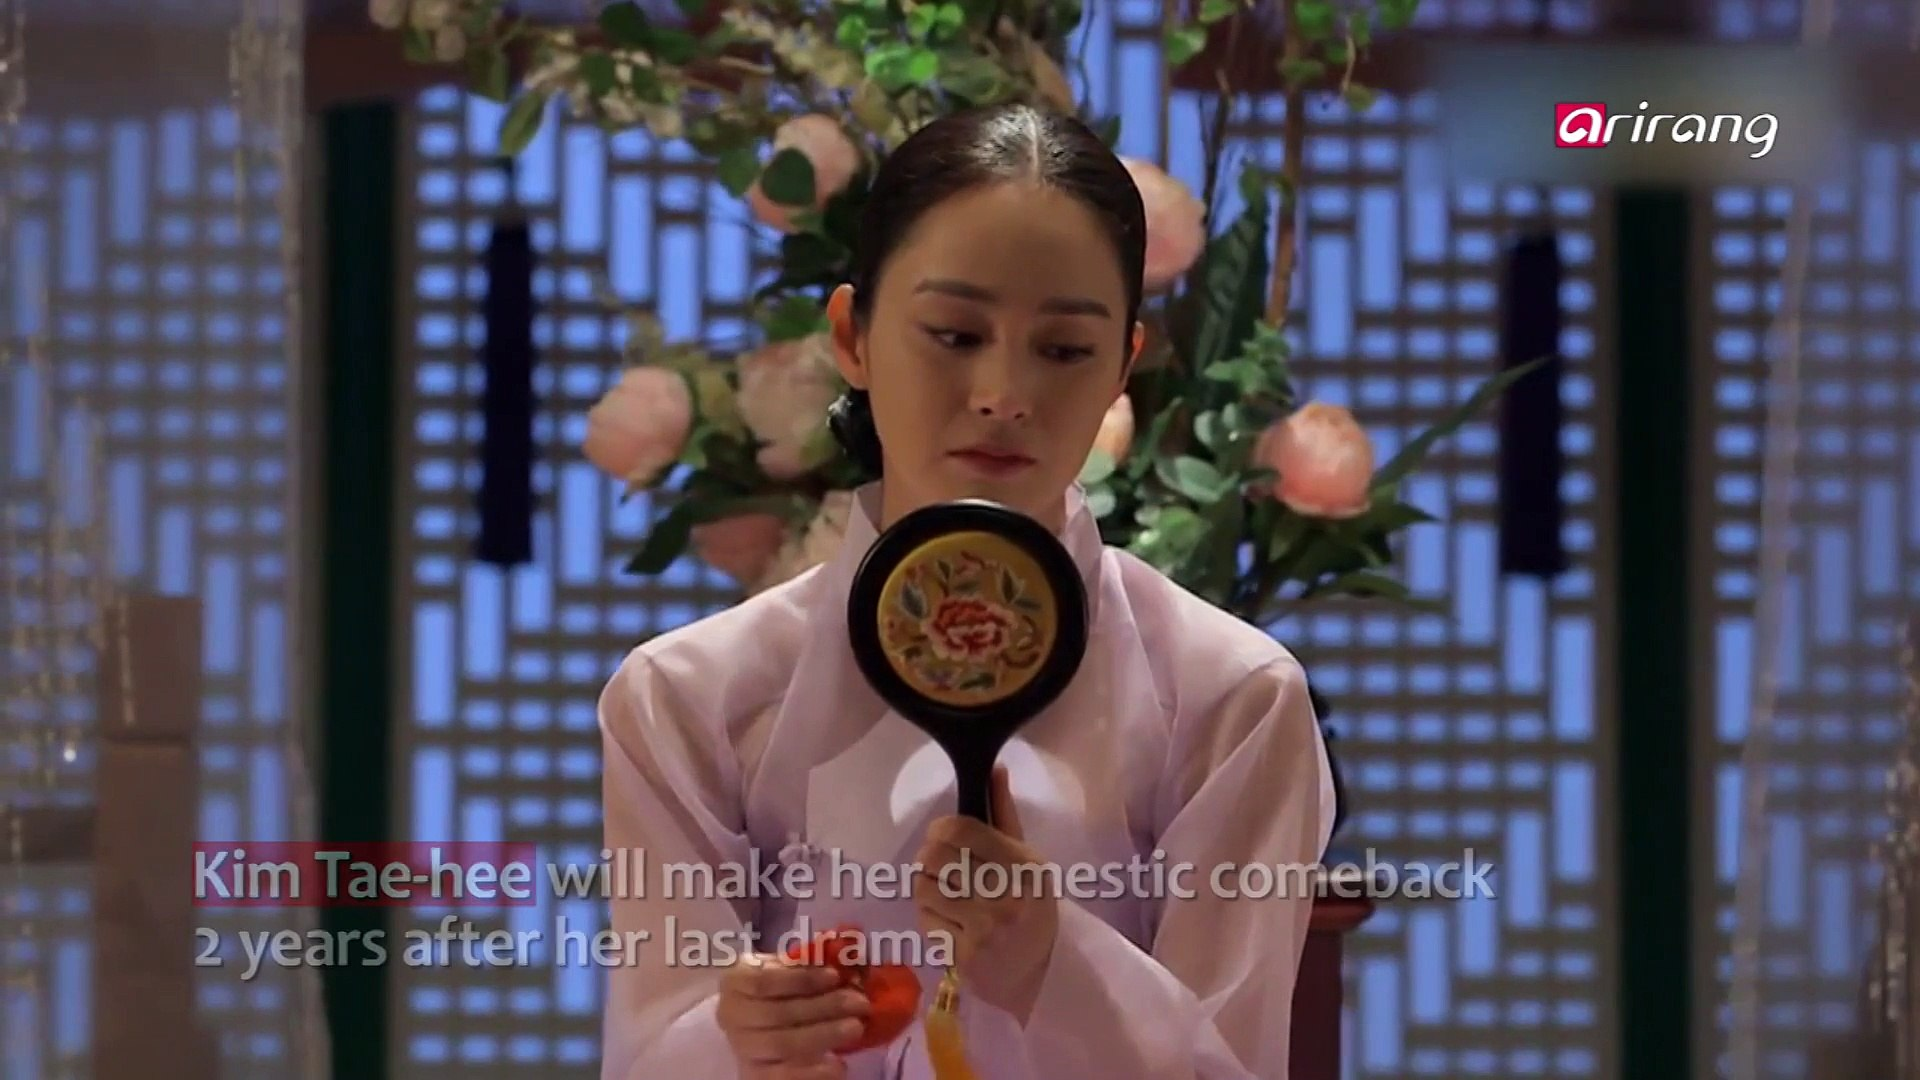 JOO WON & KIM TAE-HEE TO STAR IN A NEW DRAMA